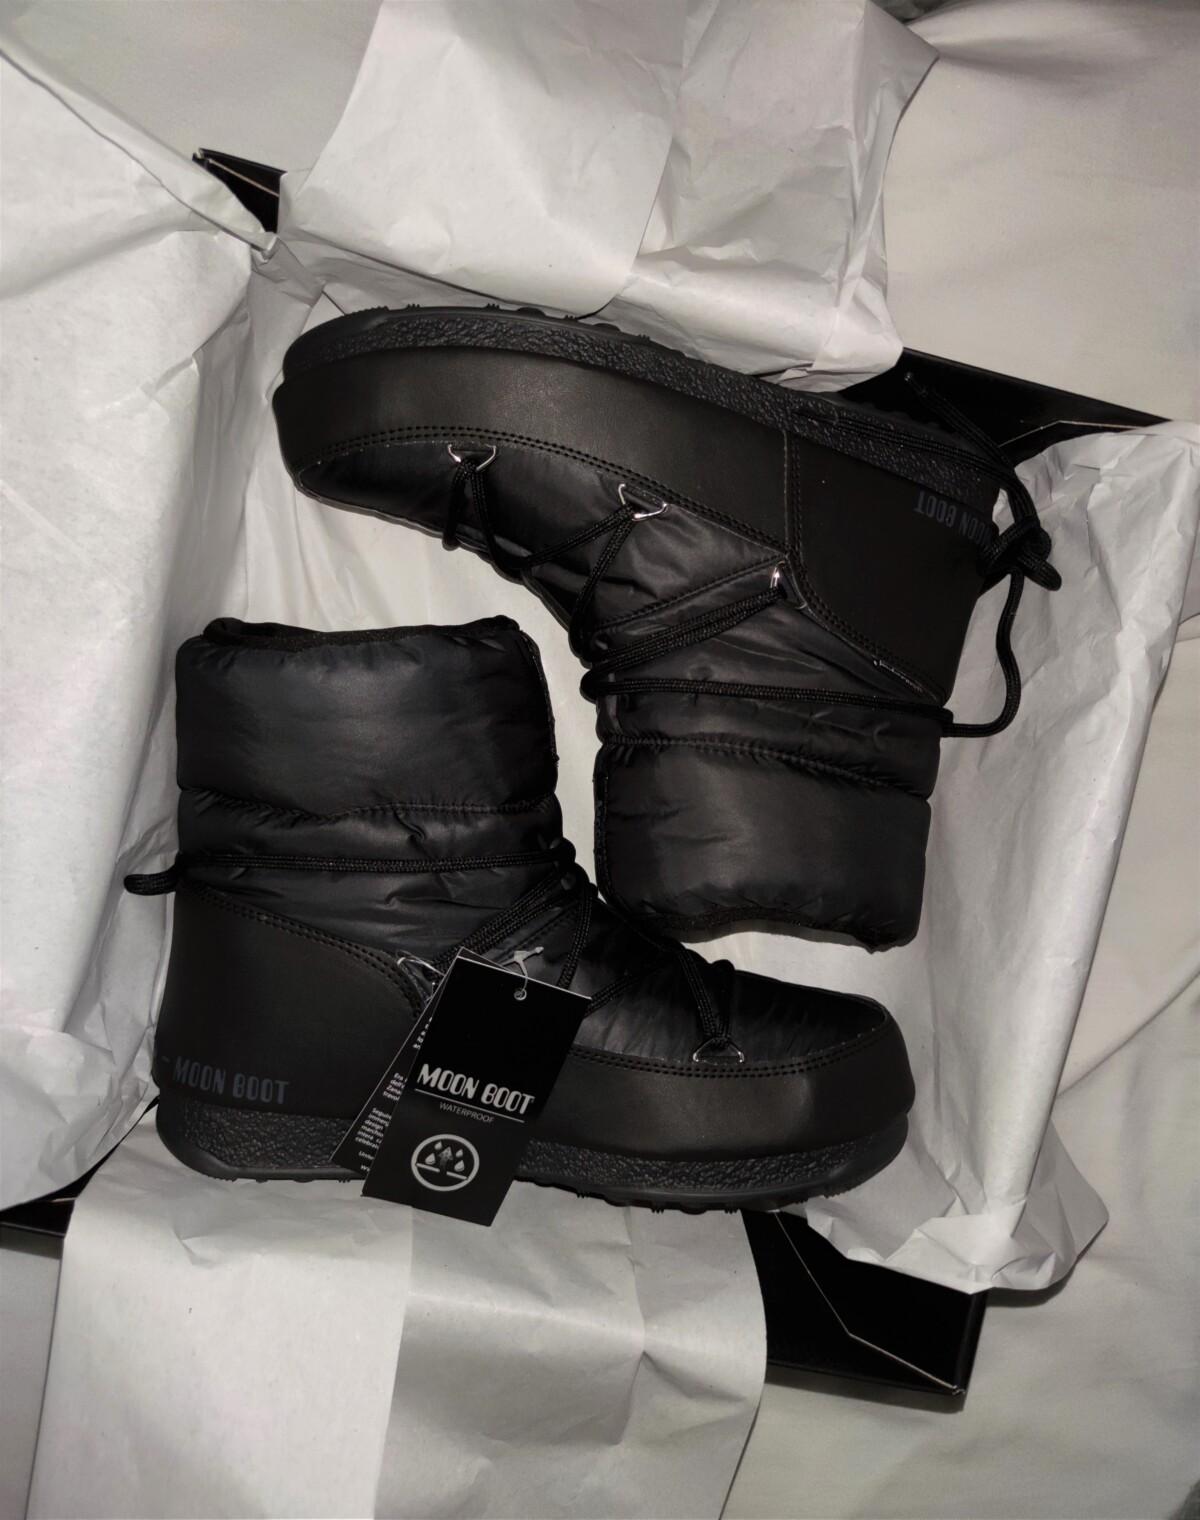 moonboot-theoriginal-sko-vintersko-anbefaling-skoanbefaling-bestesko-bestevintersko-boots-zalando-mote-trend-uggs-ugg-stil-fashion-style-shoes-bestshoes-wintershoes-innkjøp-newin-isalicious-isalicious.blogg.no